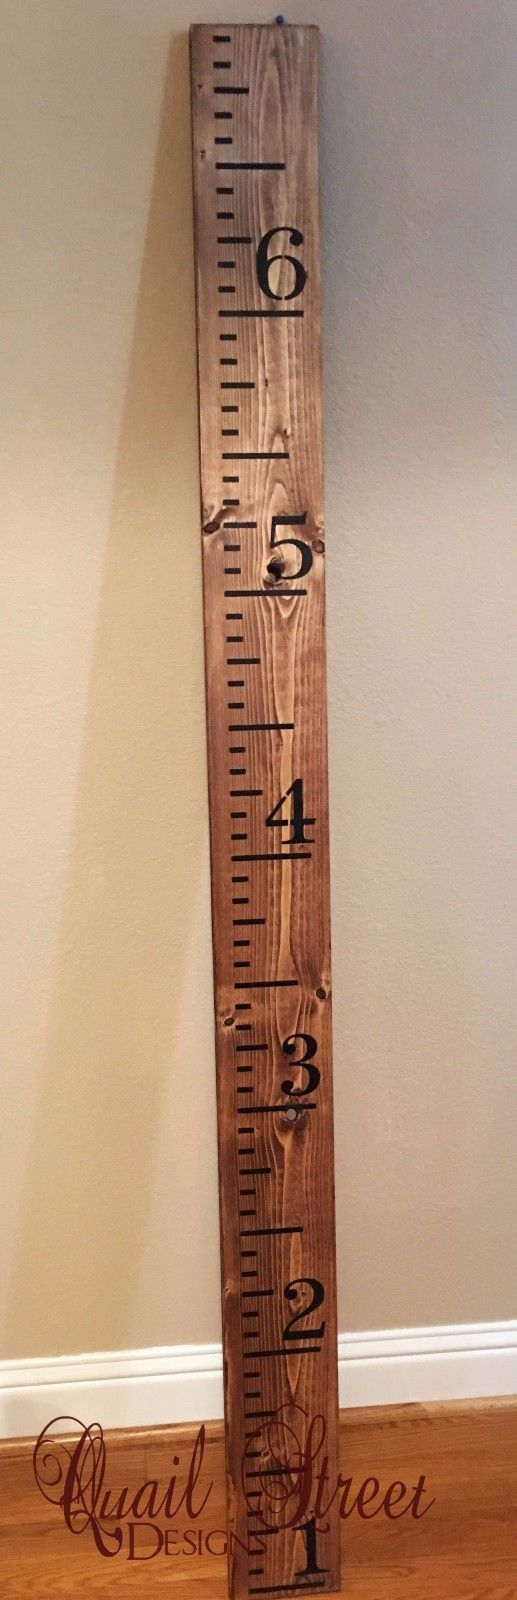 Hand painted wood growth chart ruler custom colors made in texas hand painted wood growth chart ruler custom colors made in texas geenschuldenfo Choice Image